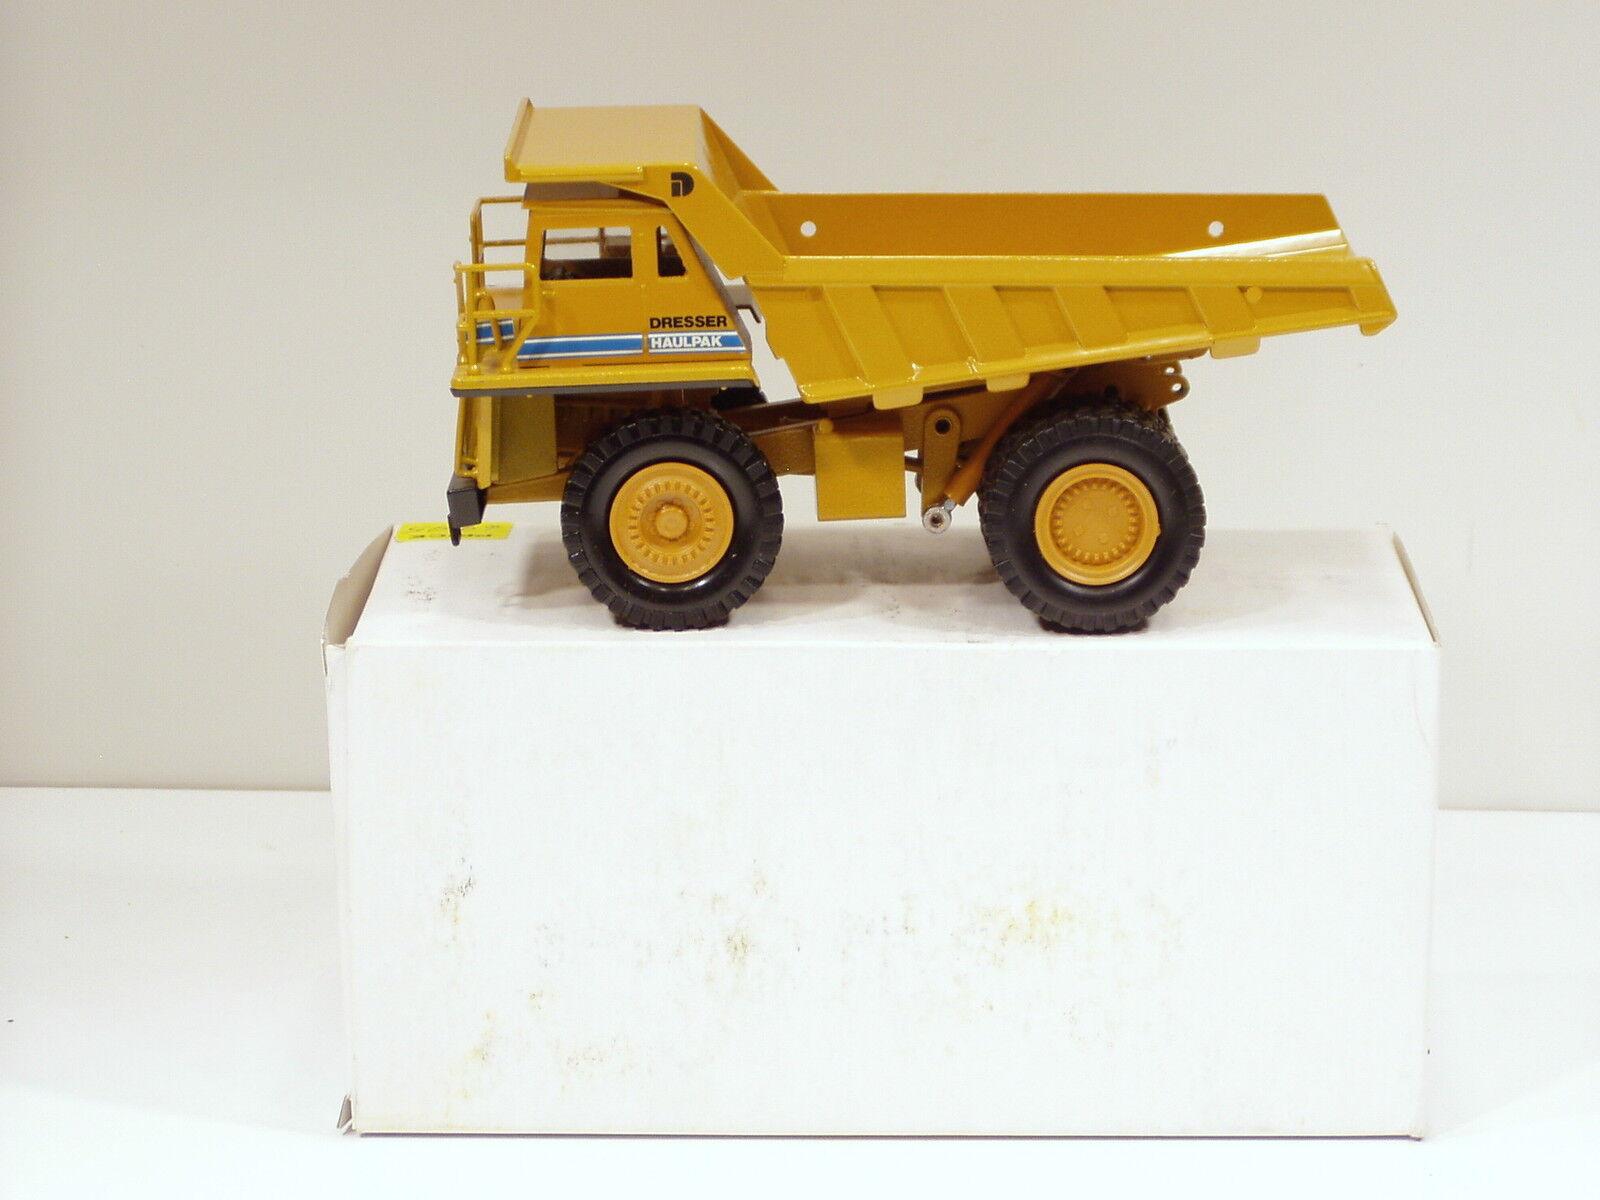 Dresser HAULPAK 210 M Camion Benne - 1 50 - Conrad  2722 - N. Comme neuf IN BOX